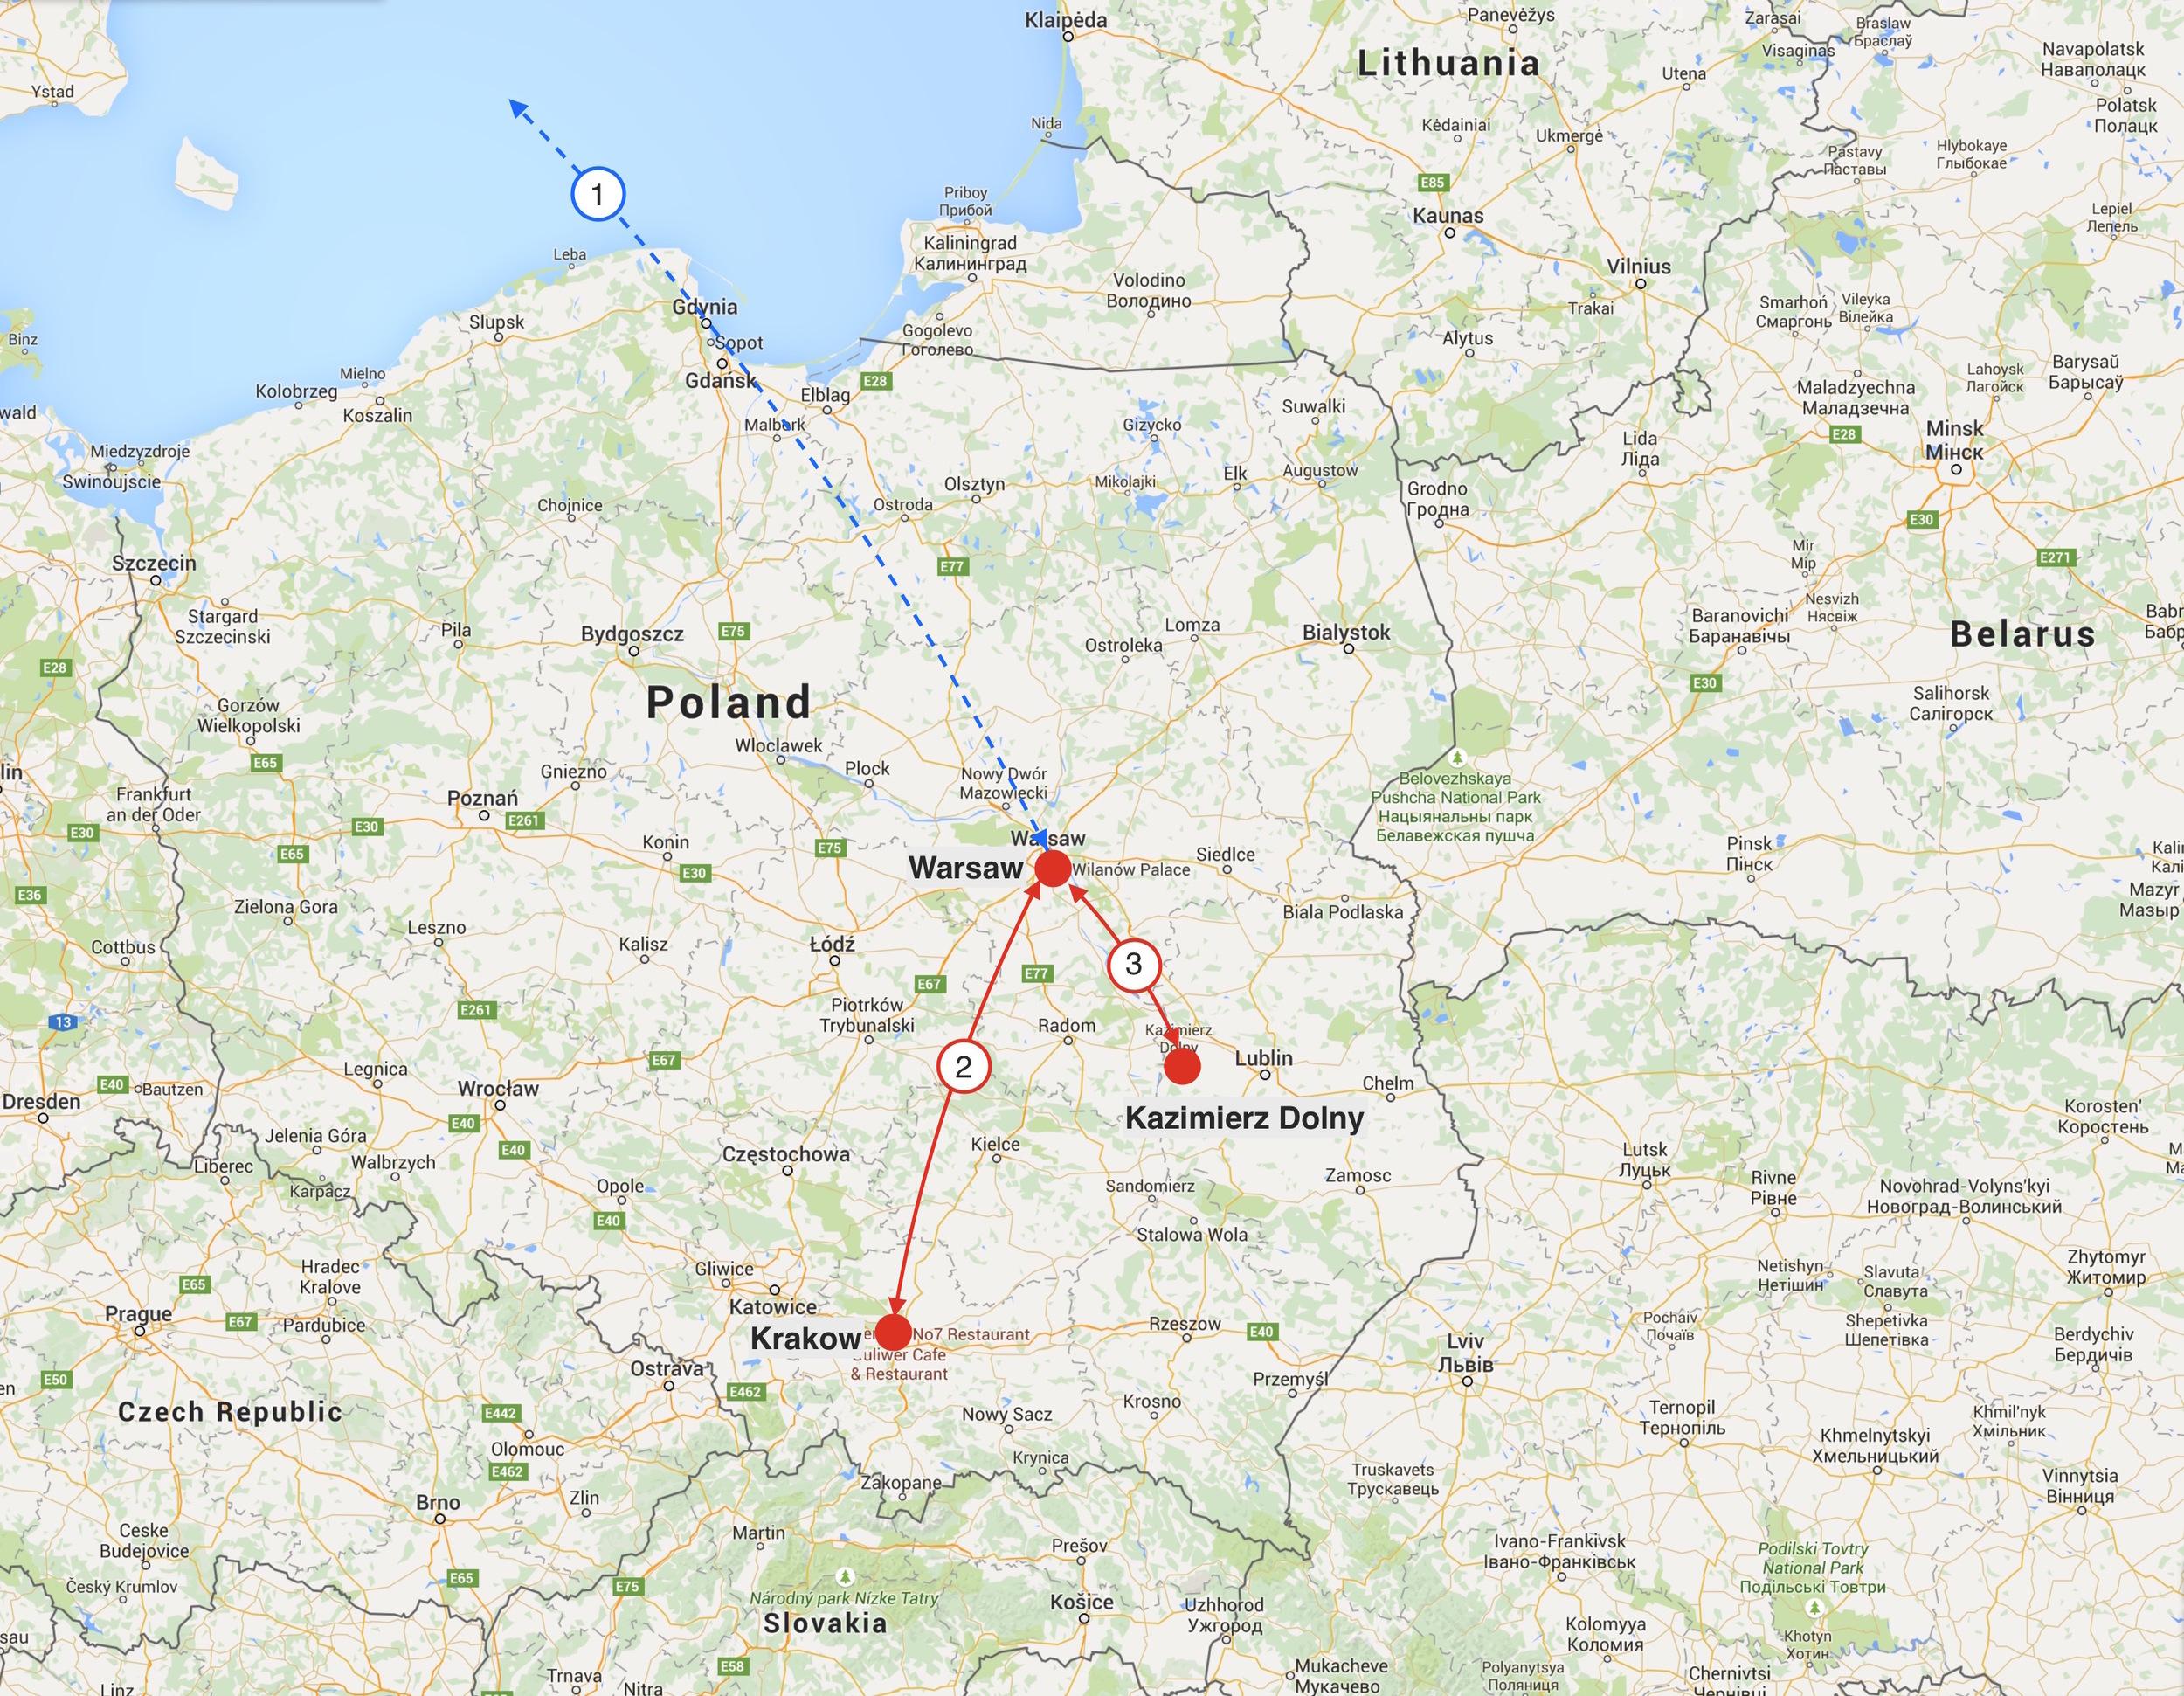 1: Flight path between Toronto and Warsaw 2: Train between Warsaw and Krakow 3: Bus between Kazimierz Dolny and Warsaw